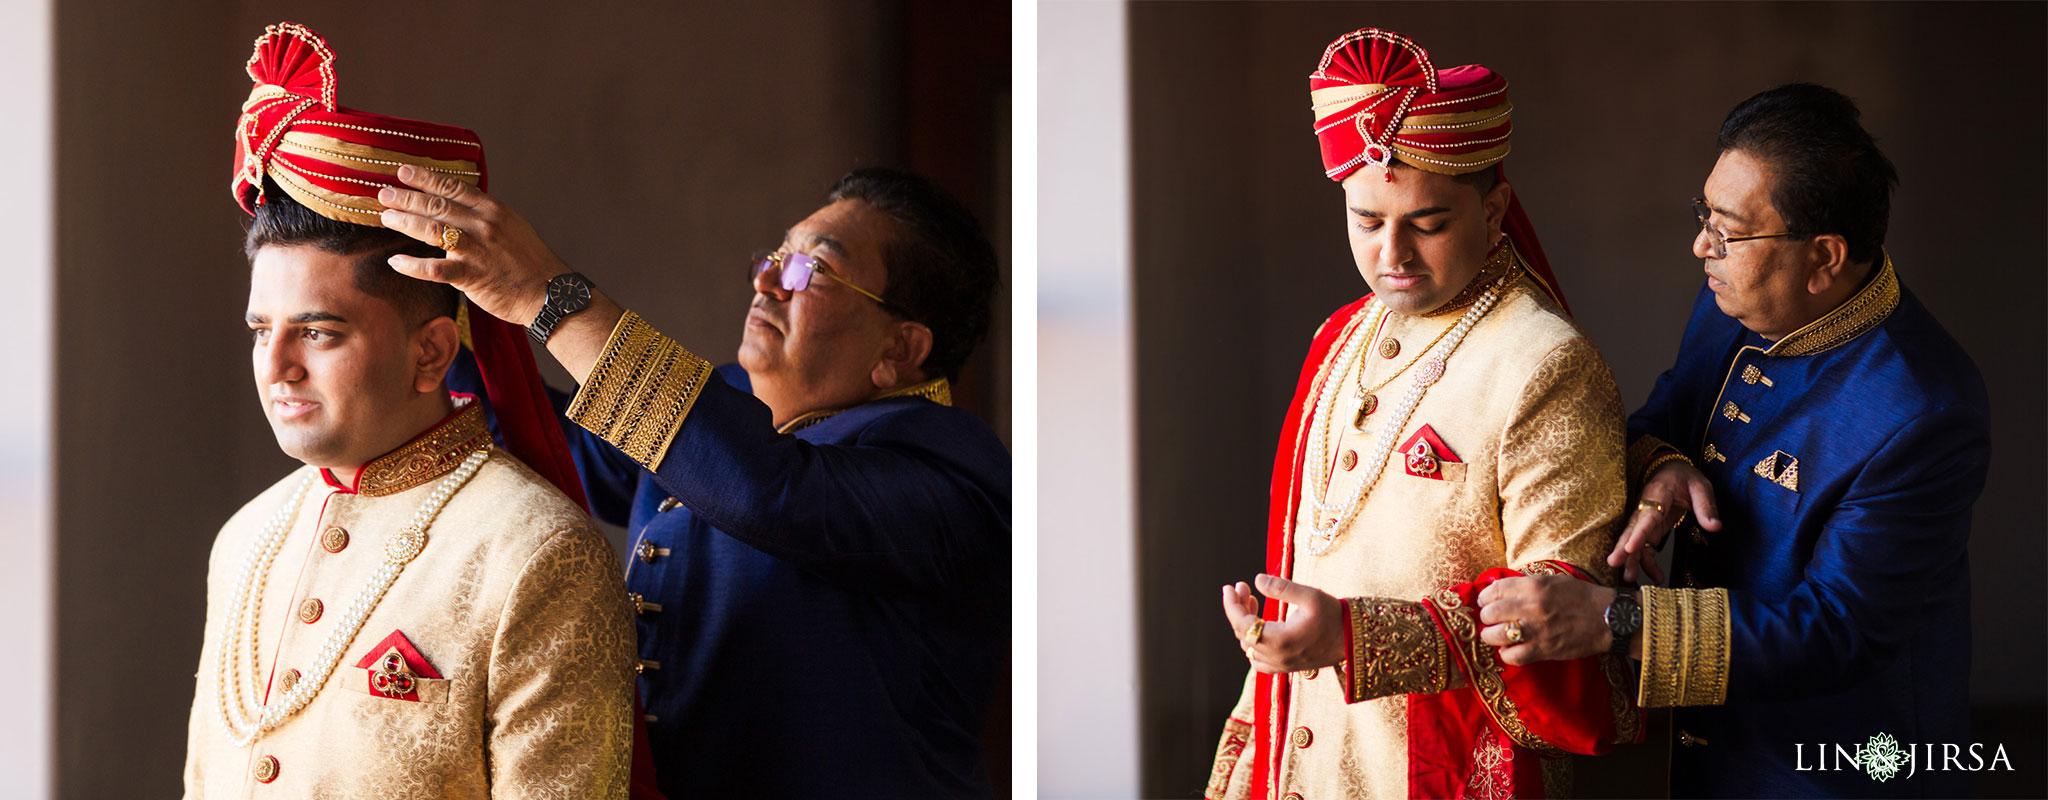 069 BAPS Swaminarayan Sanstha Chino Hills Indian Wedding Photography